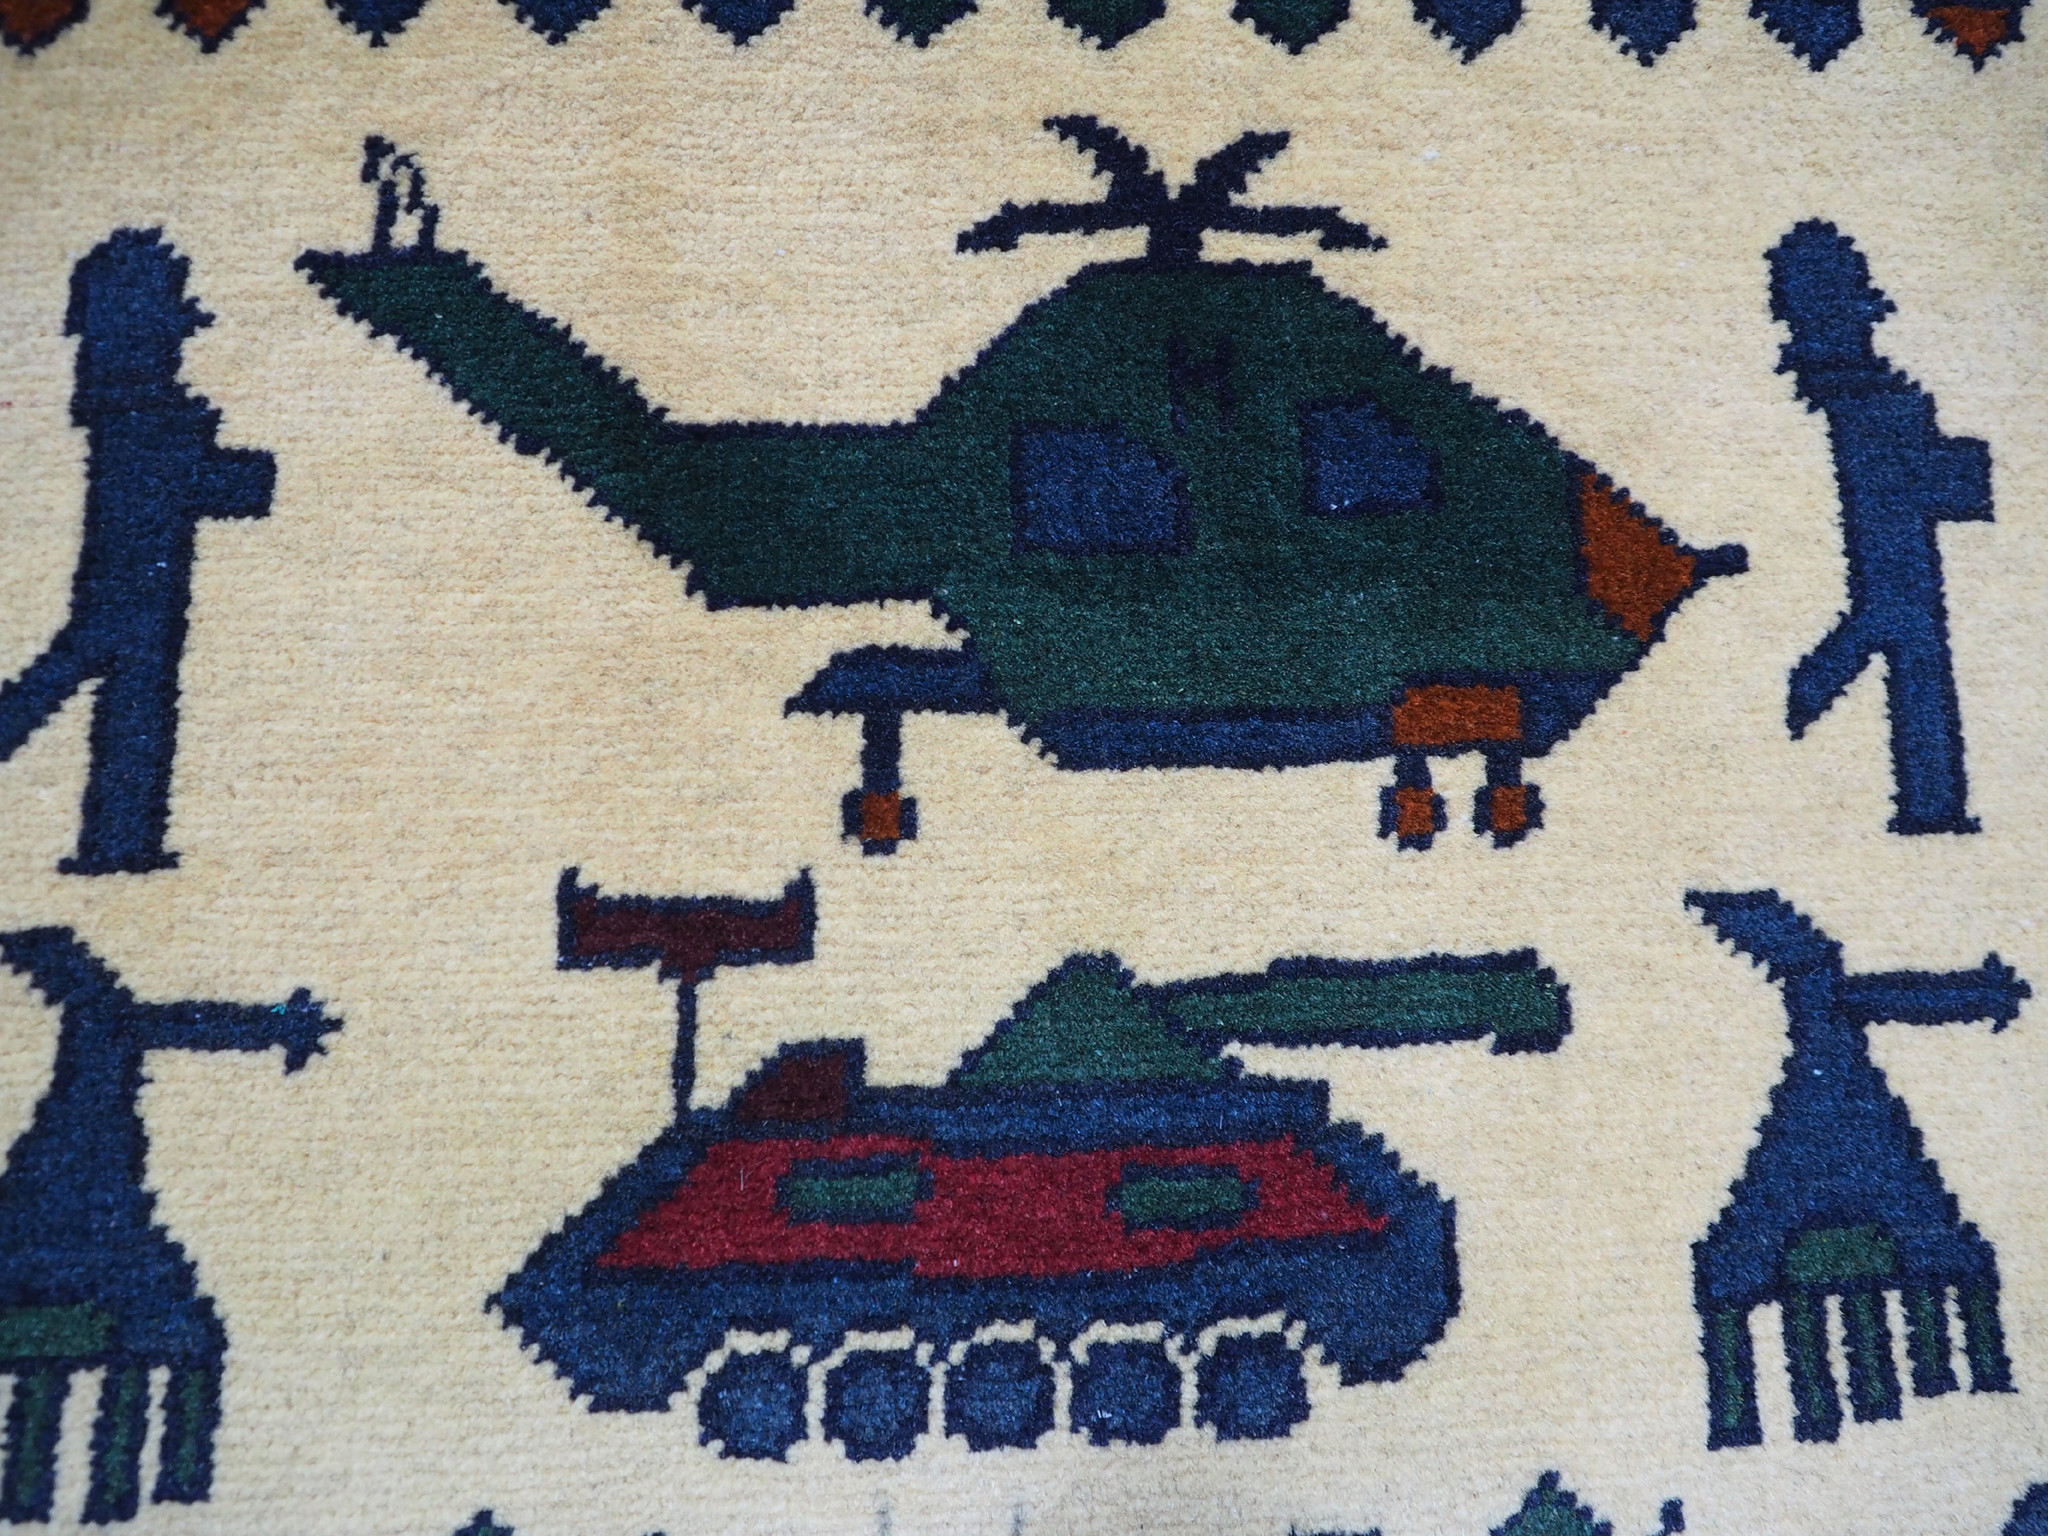 141x101 cm Afghan Kriegteppich Handgeknüpf Teppich Afghanistan panzer kampfjet gewehr USA Army Nato ISAF war rug Nr:AFG21C